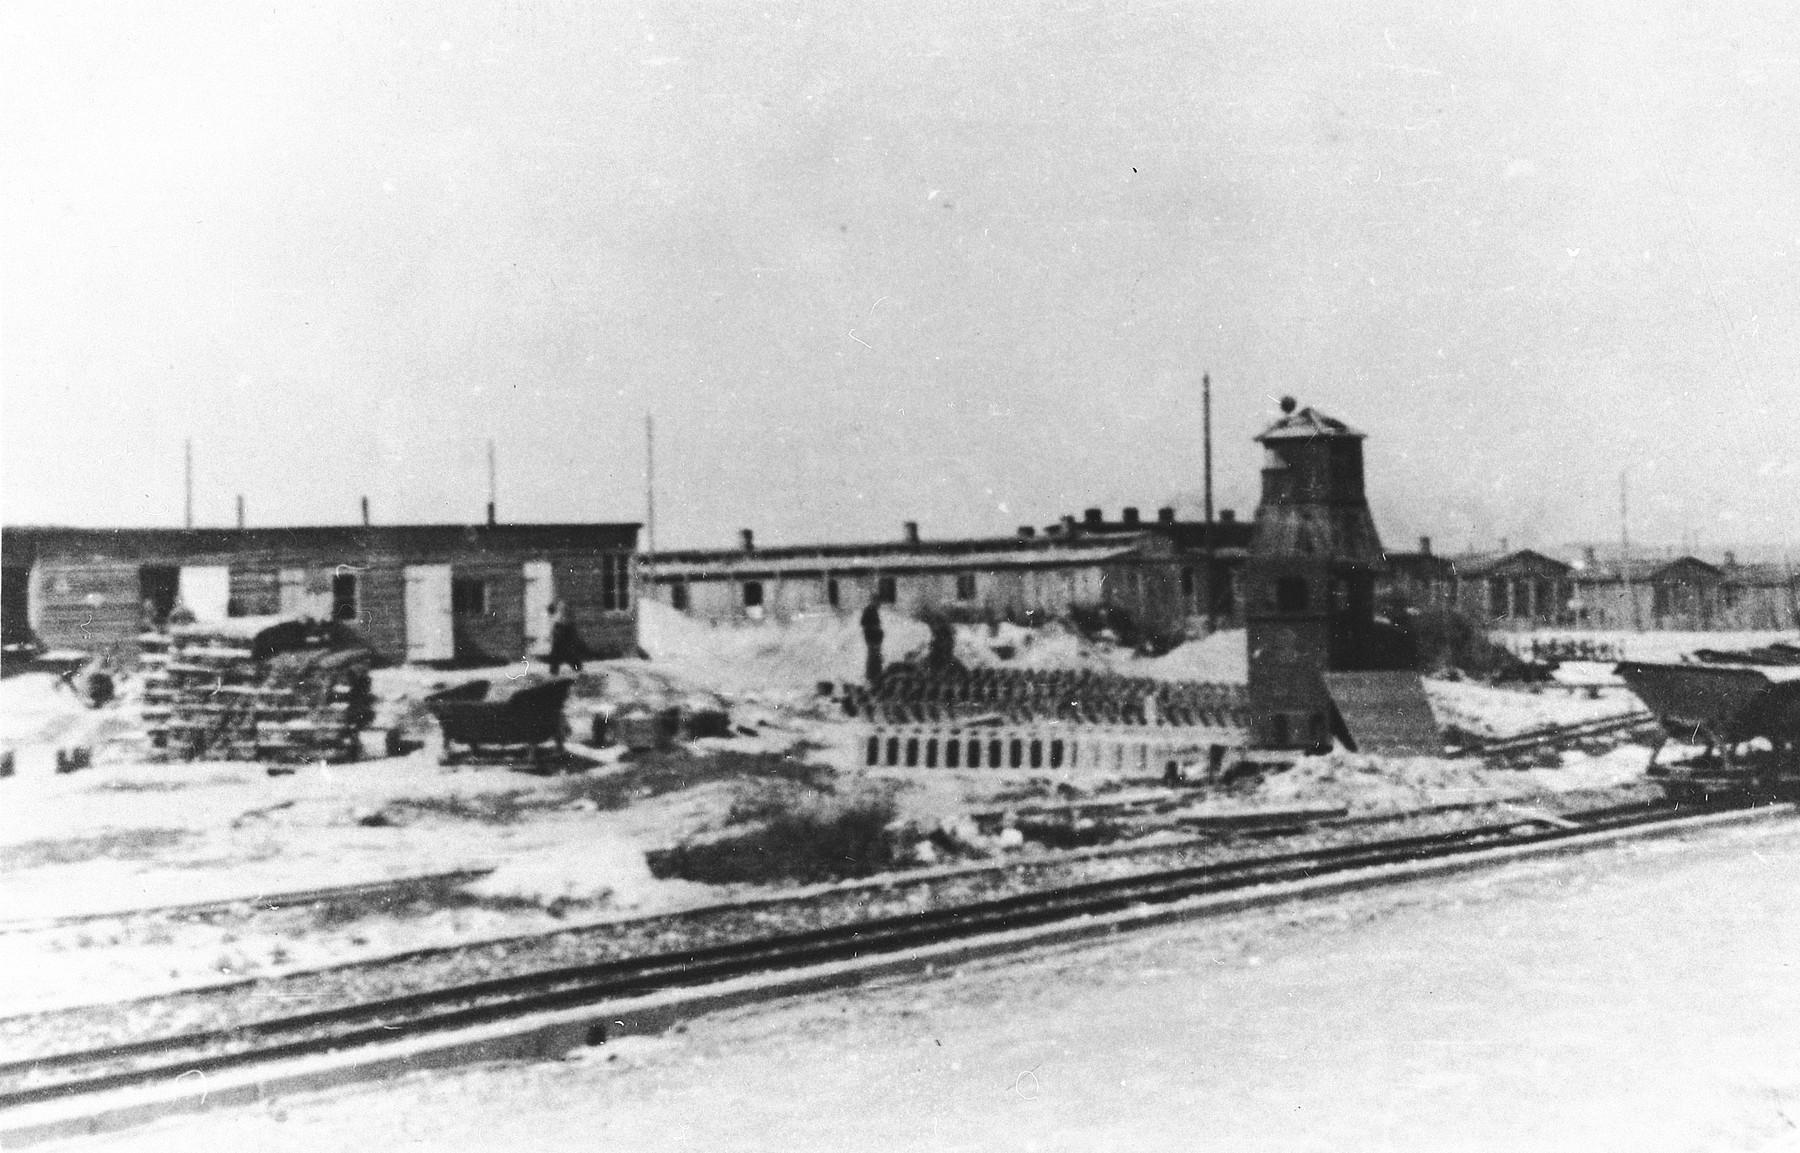 Prisoners at forced labor in the Majdanek concentration camp.